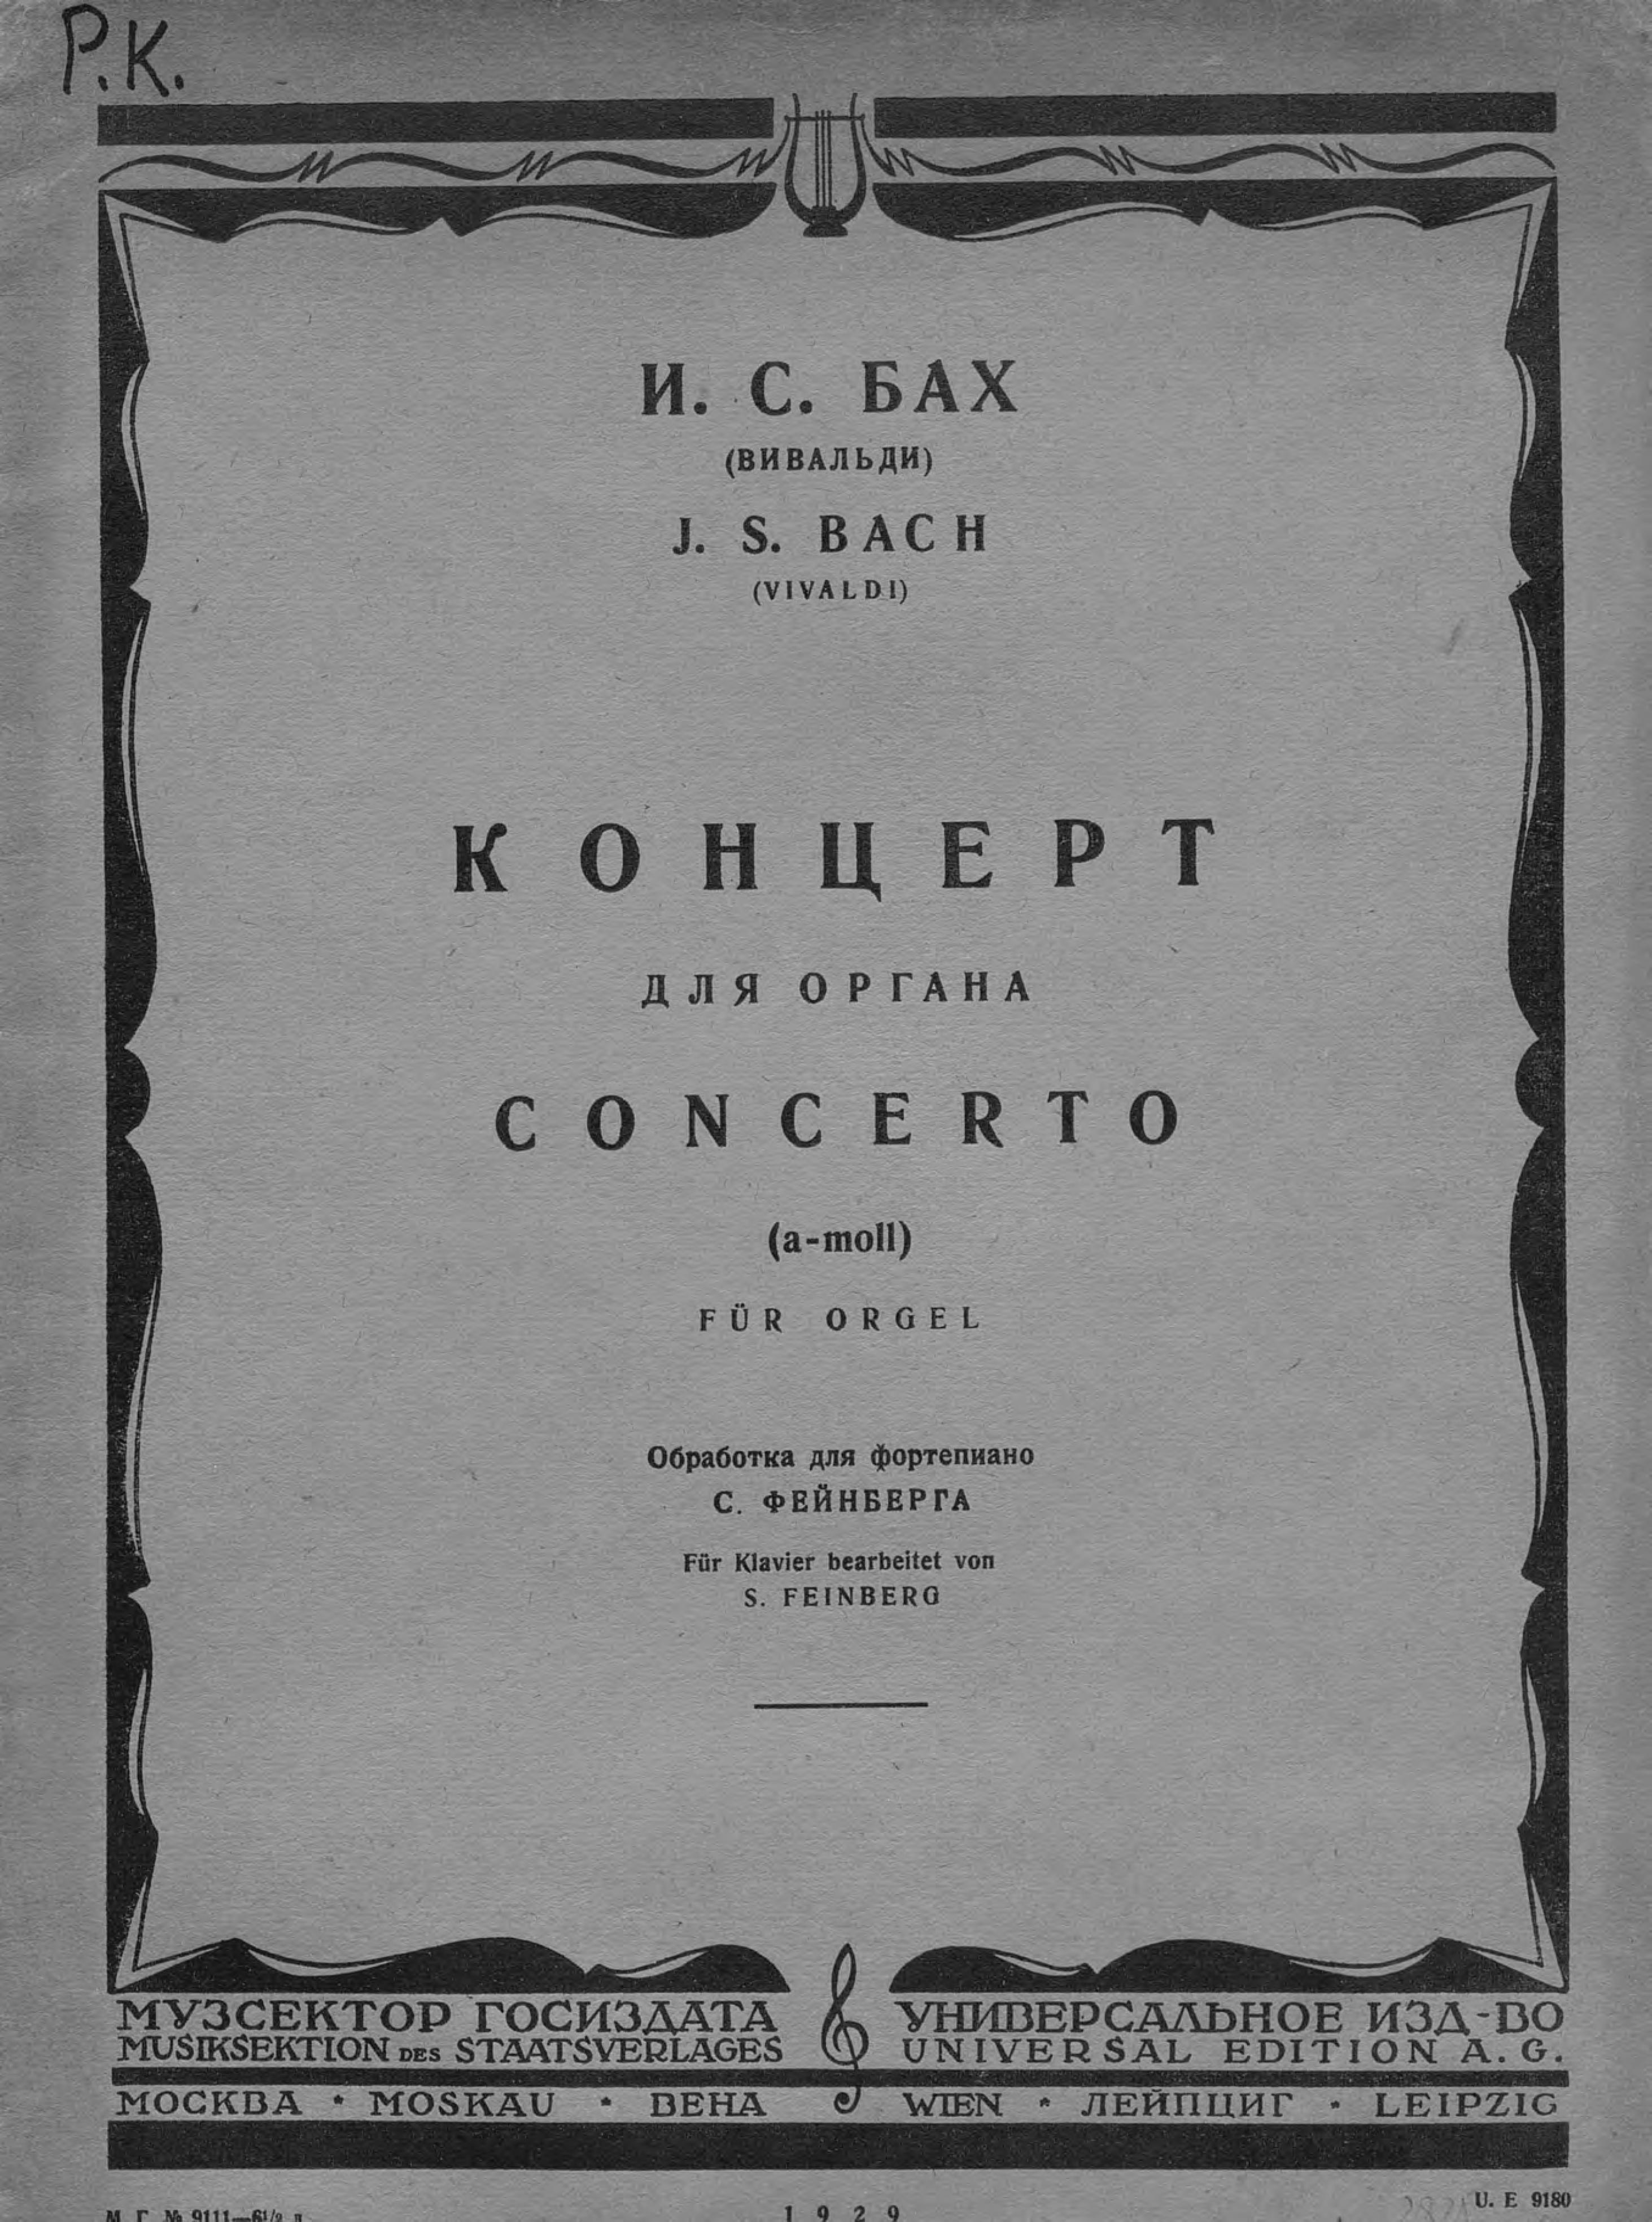 Иоганн Себастьян Бах Концерт для органа. (a-moll) иоганн себастьян бах хроматическая фантазия и фуга